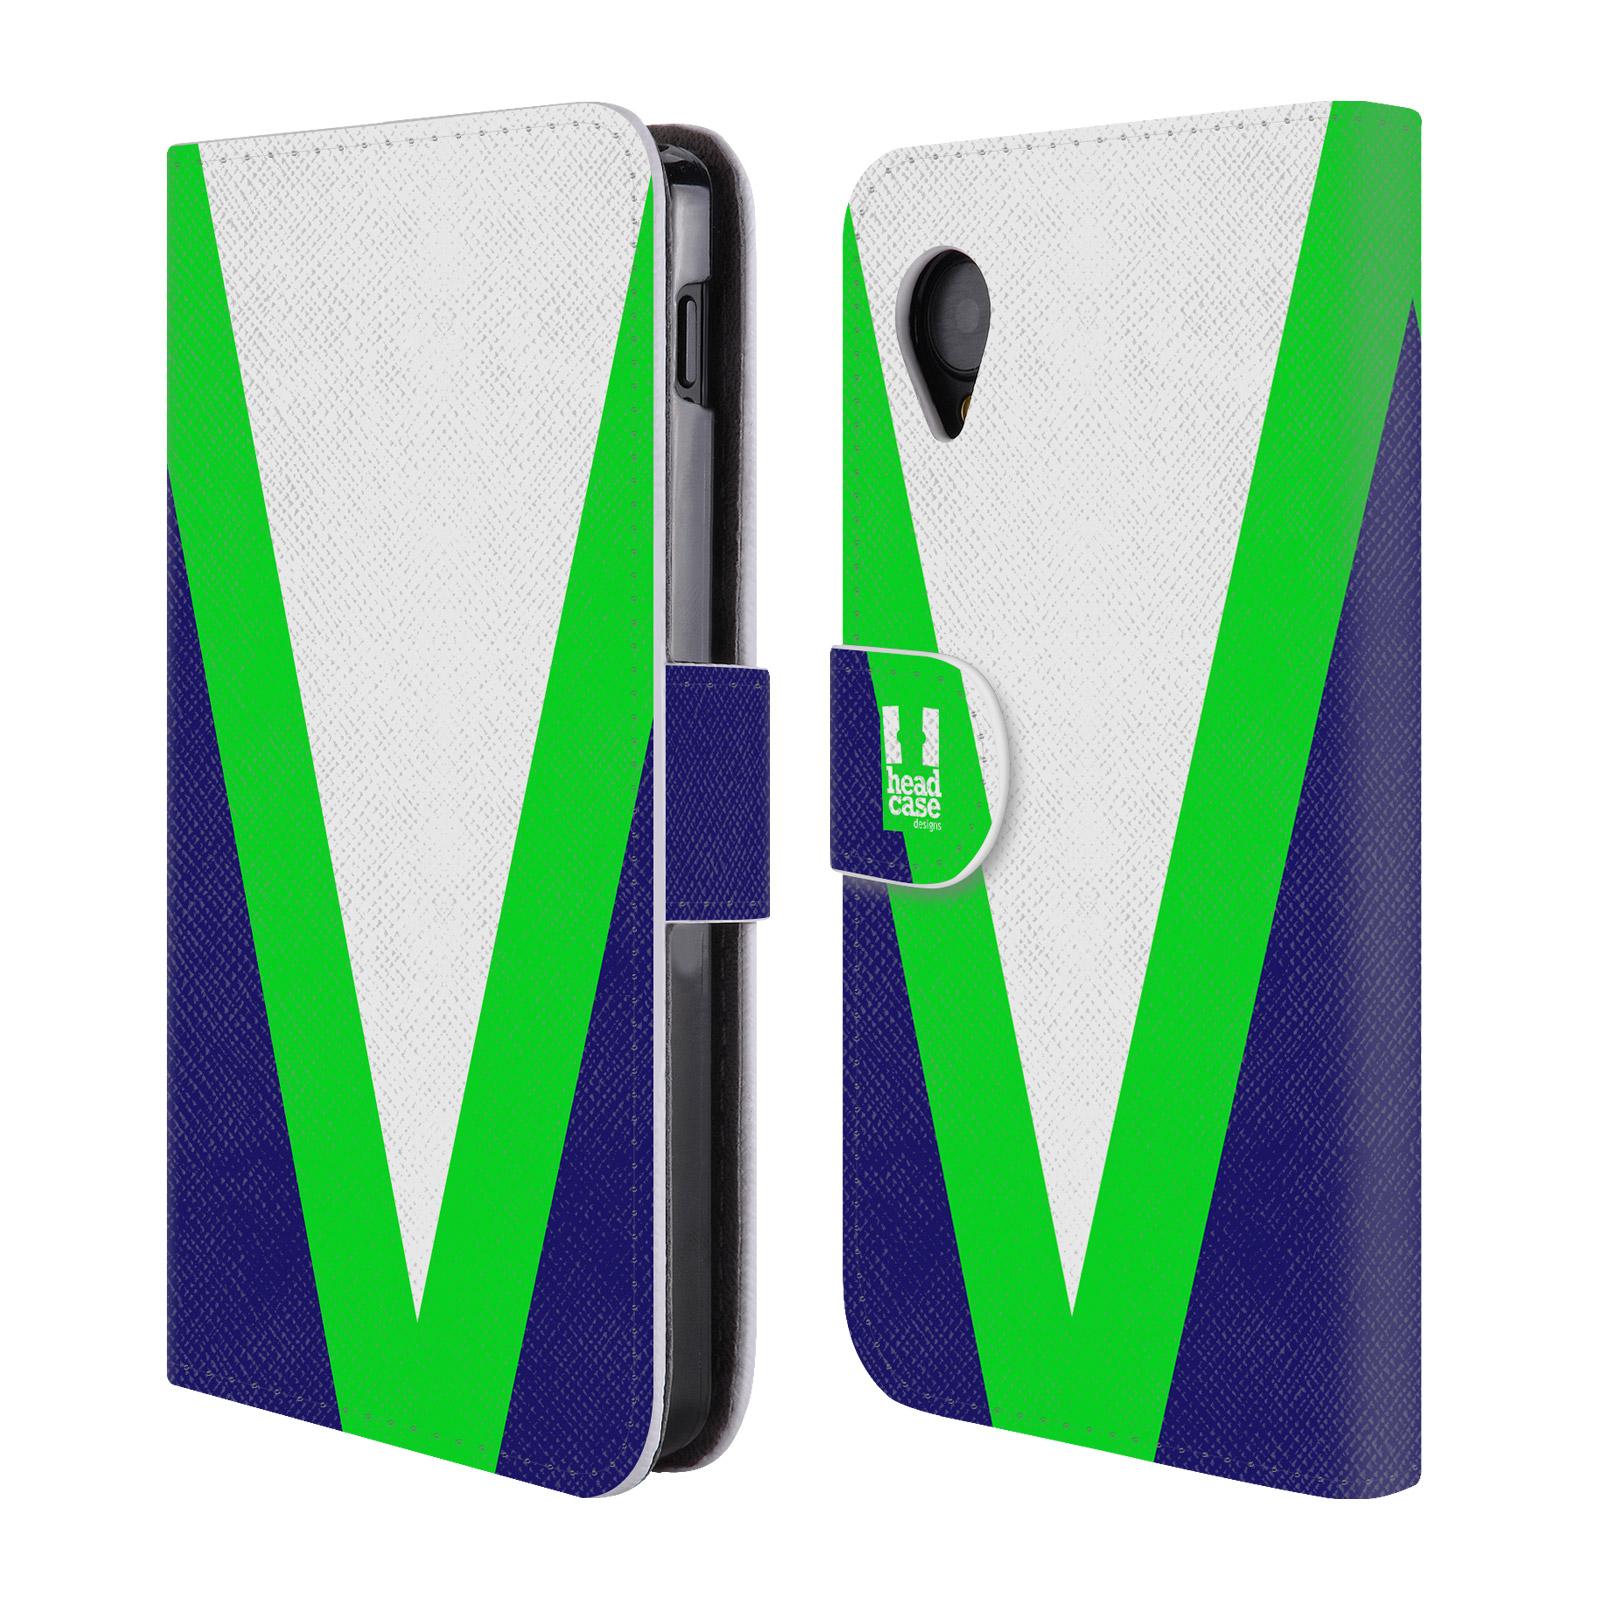 HEAD CASE Flipové pouzdro pro mobil LG GOOGLE NEXUS 5 barevné tvary zelená a modrá